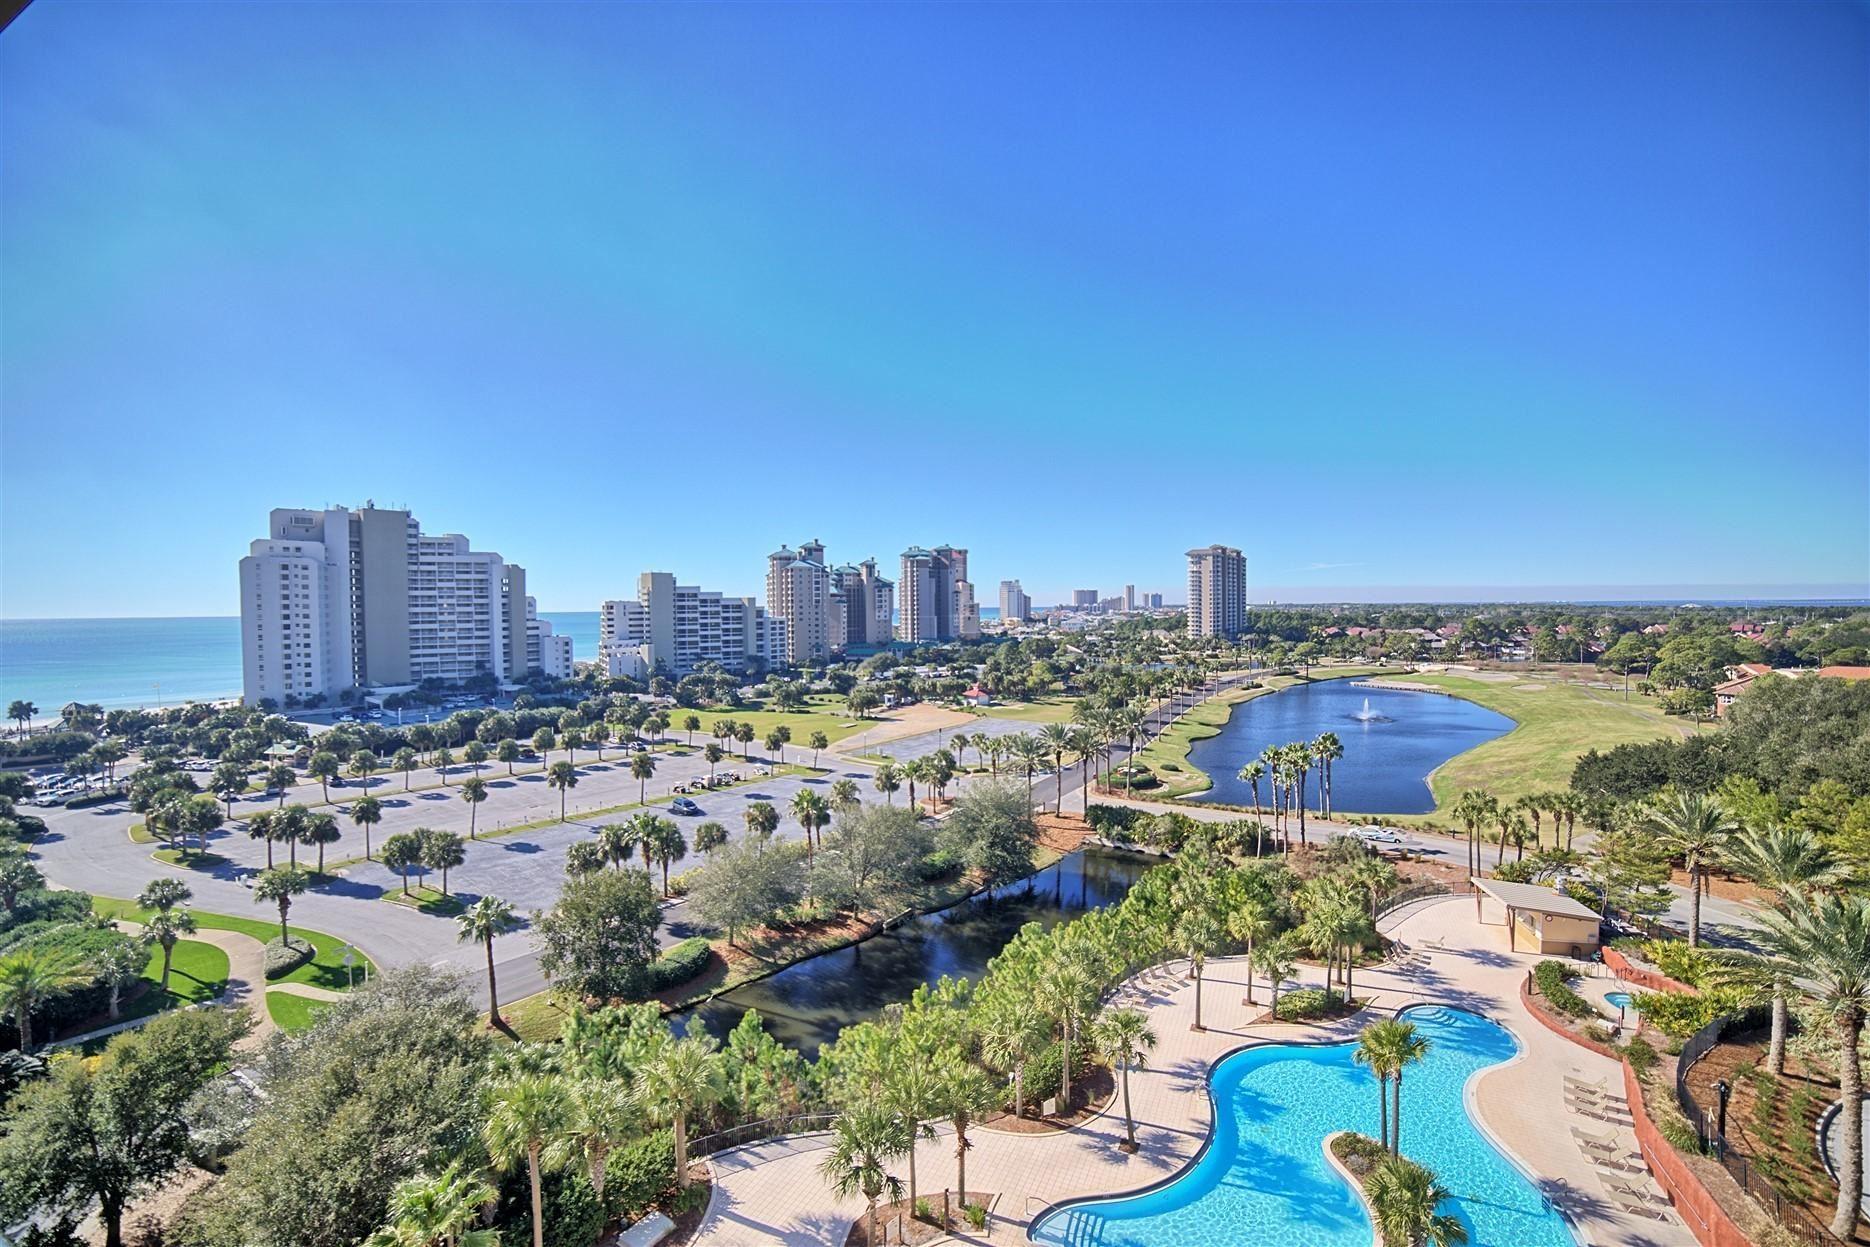 Photo for 5002 Sandestin Blvd S #6828, Miramar Beach, FL 32550 (MLS # 815497)